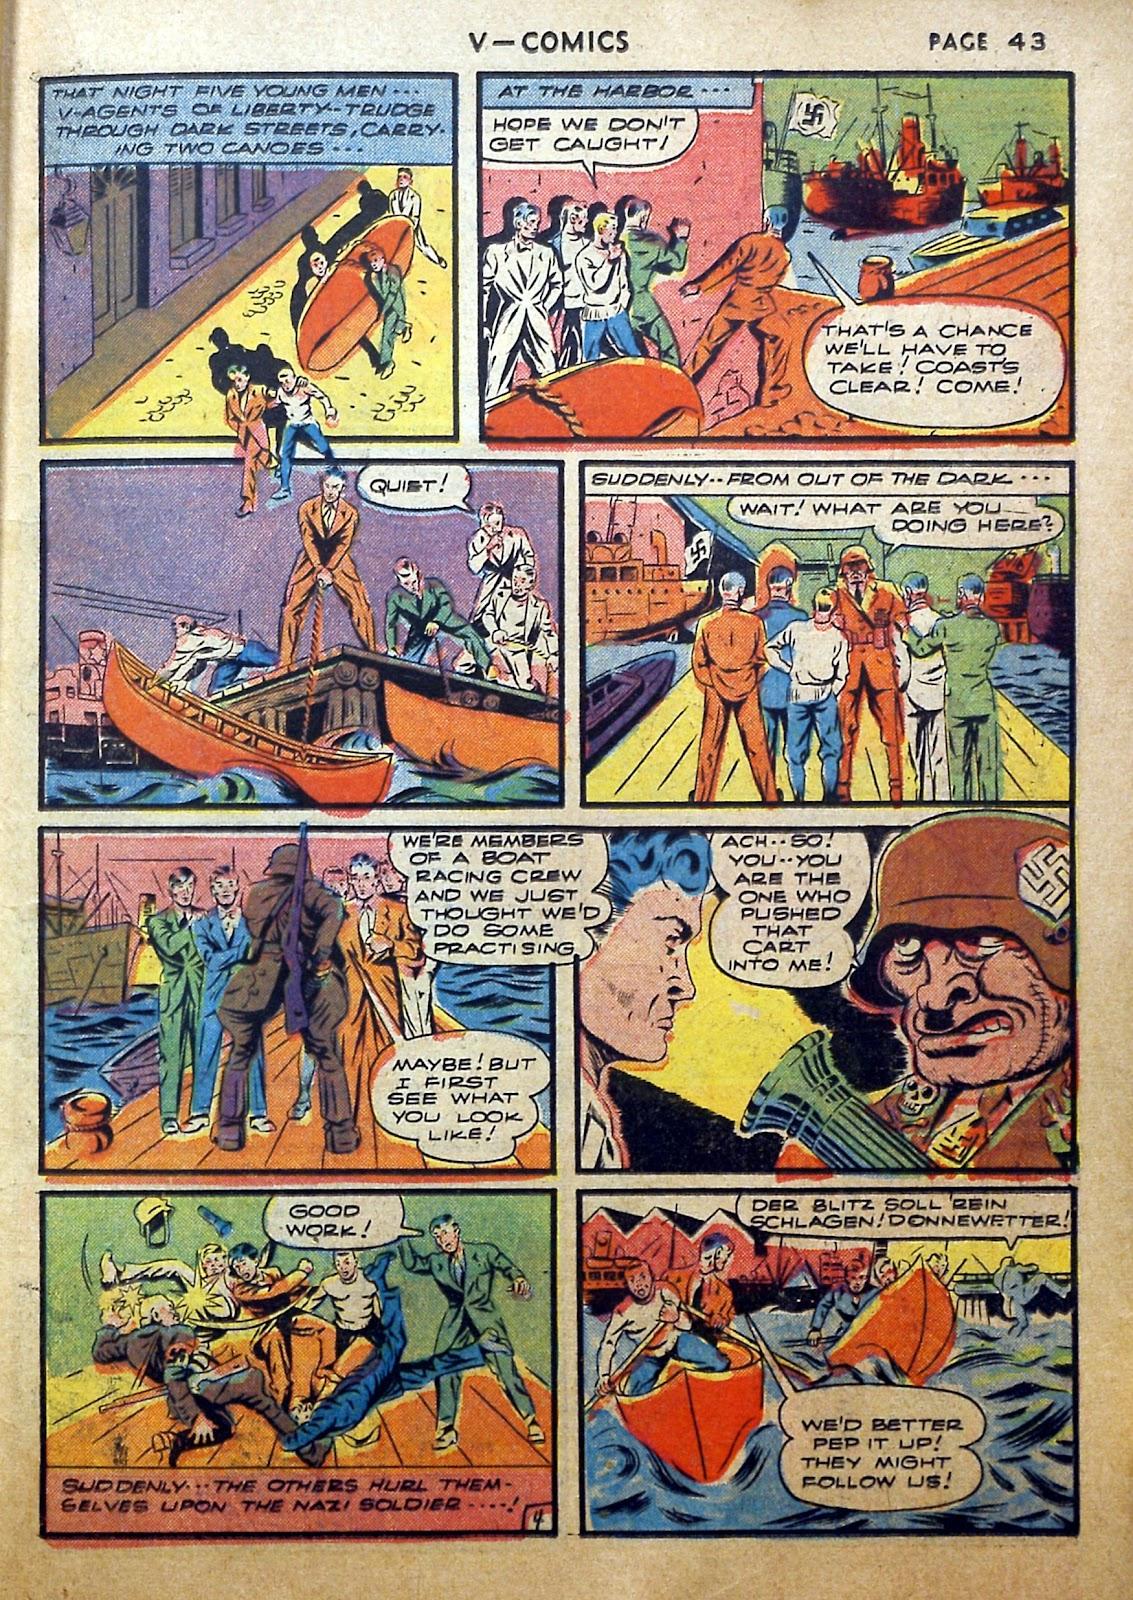 Read online V...- Comics comic -  Issue #2 - 44